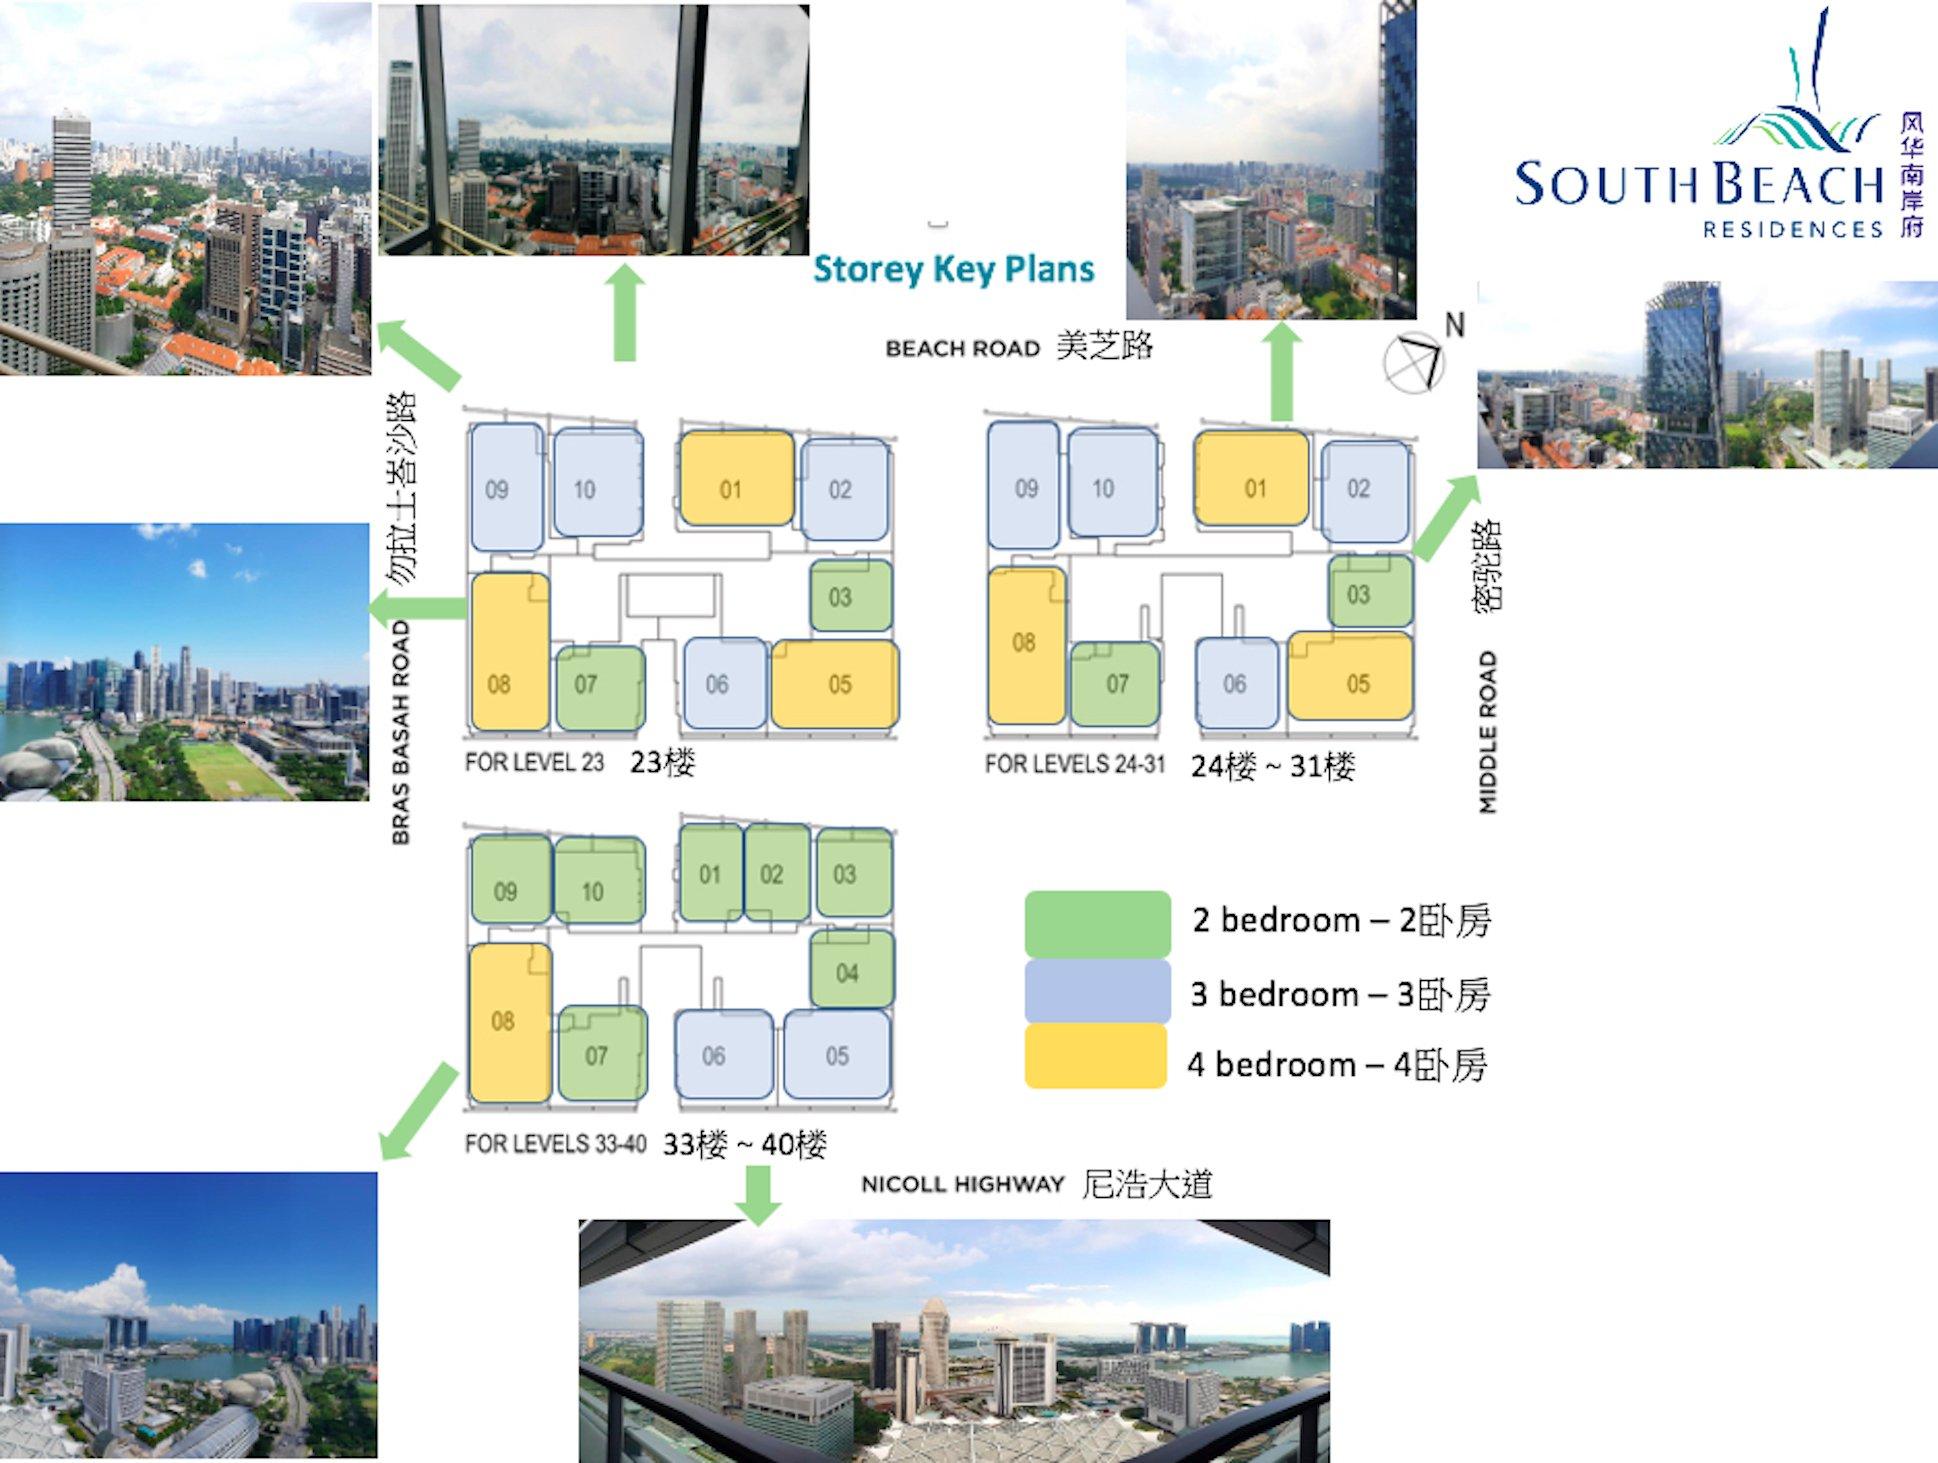 South Beach Residences-风华南岸府户型方向区位图